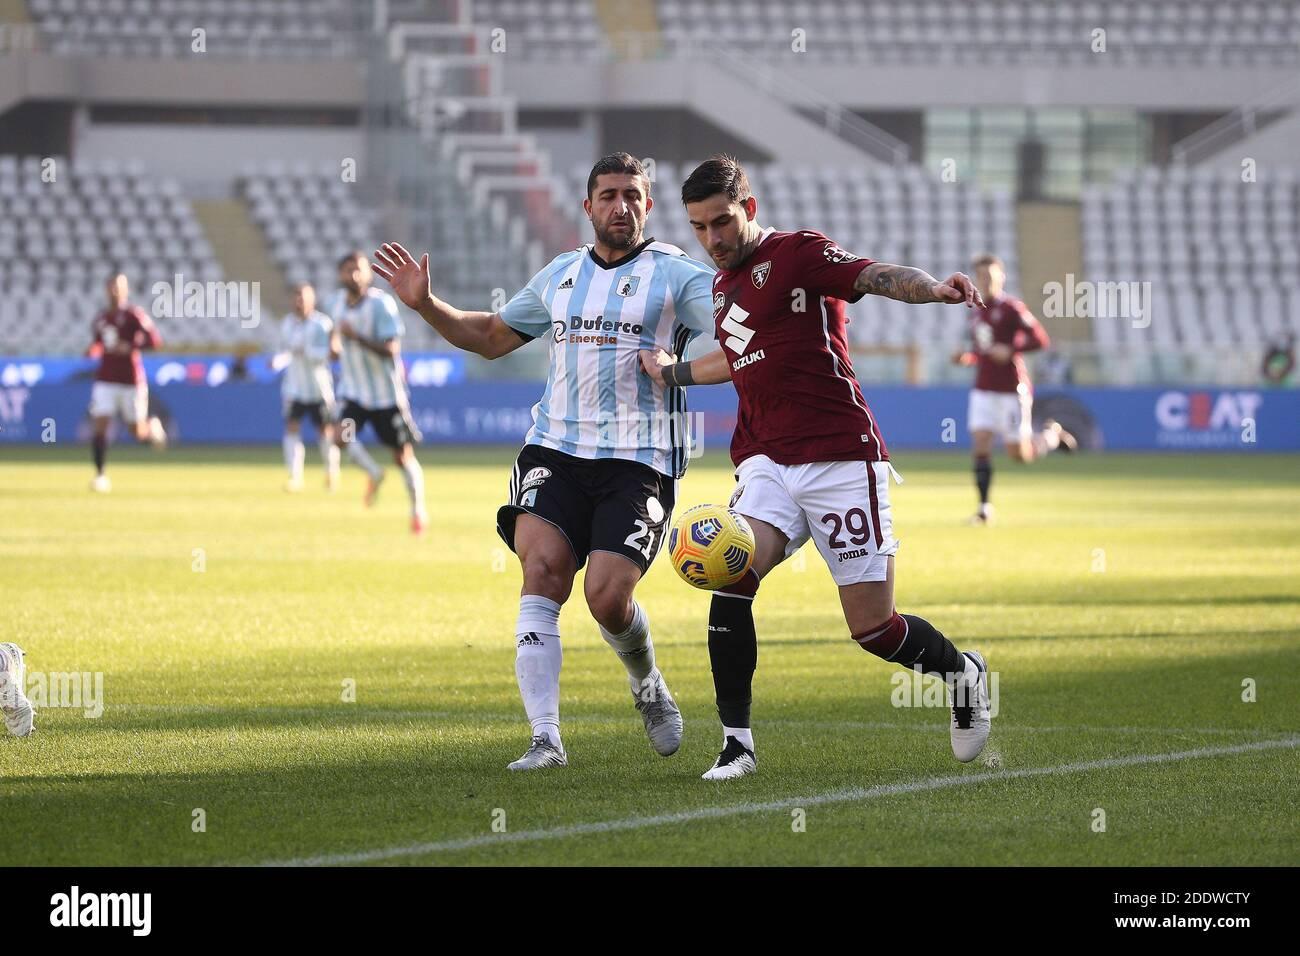 ITALIAN CUP 4th round, TURIN vs VIRTUS ENTELLA: MURRU vs COPPOLARO Stock Photo